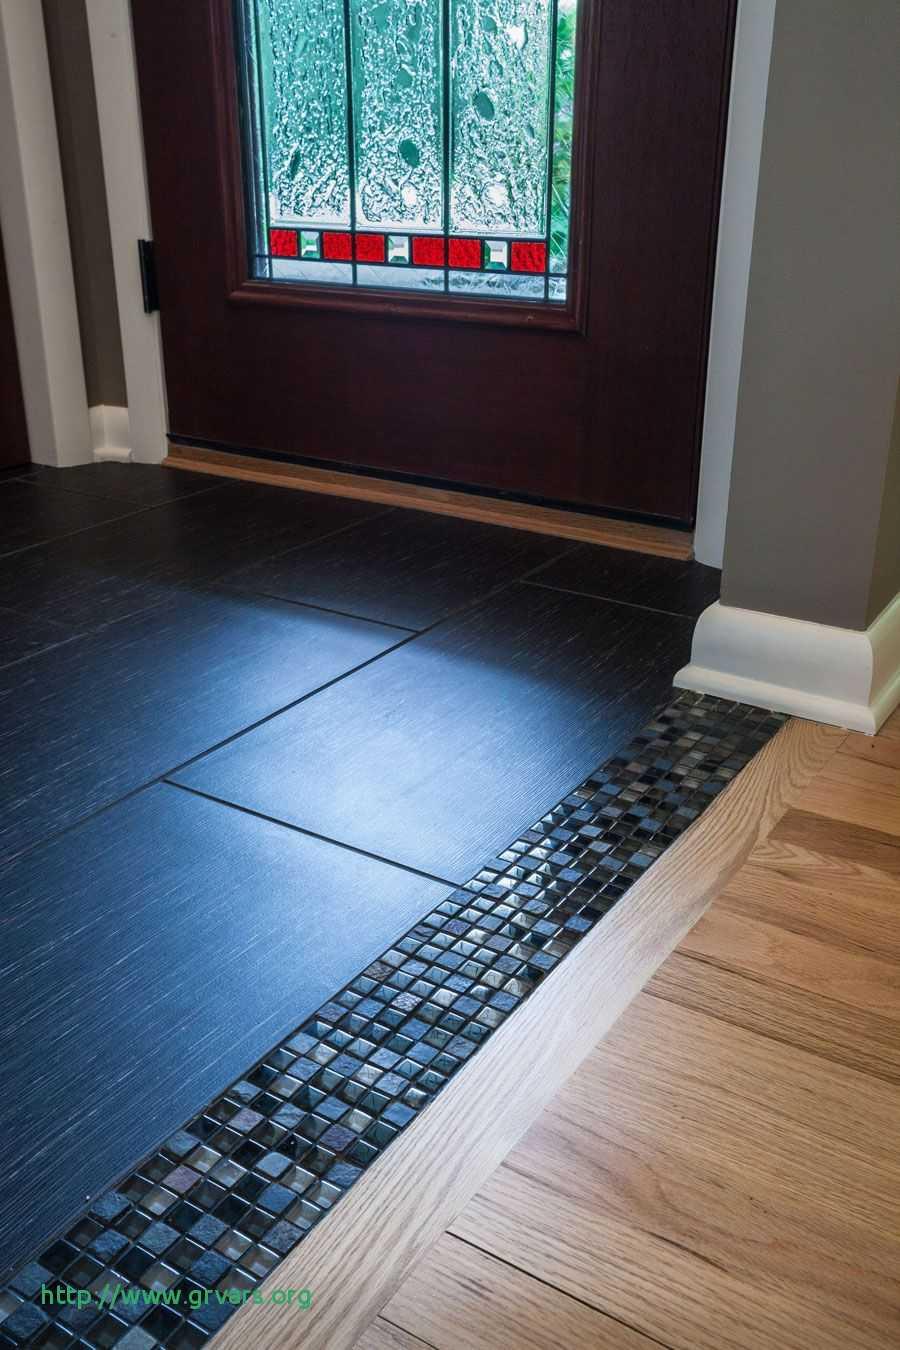 hardwood floor to carpet trim of strip flooring definition nouveau samsung sled 2010svs46 60 240hz 72 pertaining to strip flooring definition beau the absolute guide to hardwood flooring floor pinterest